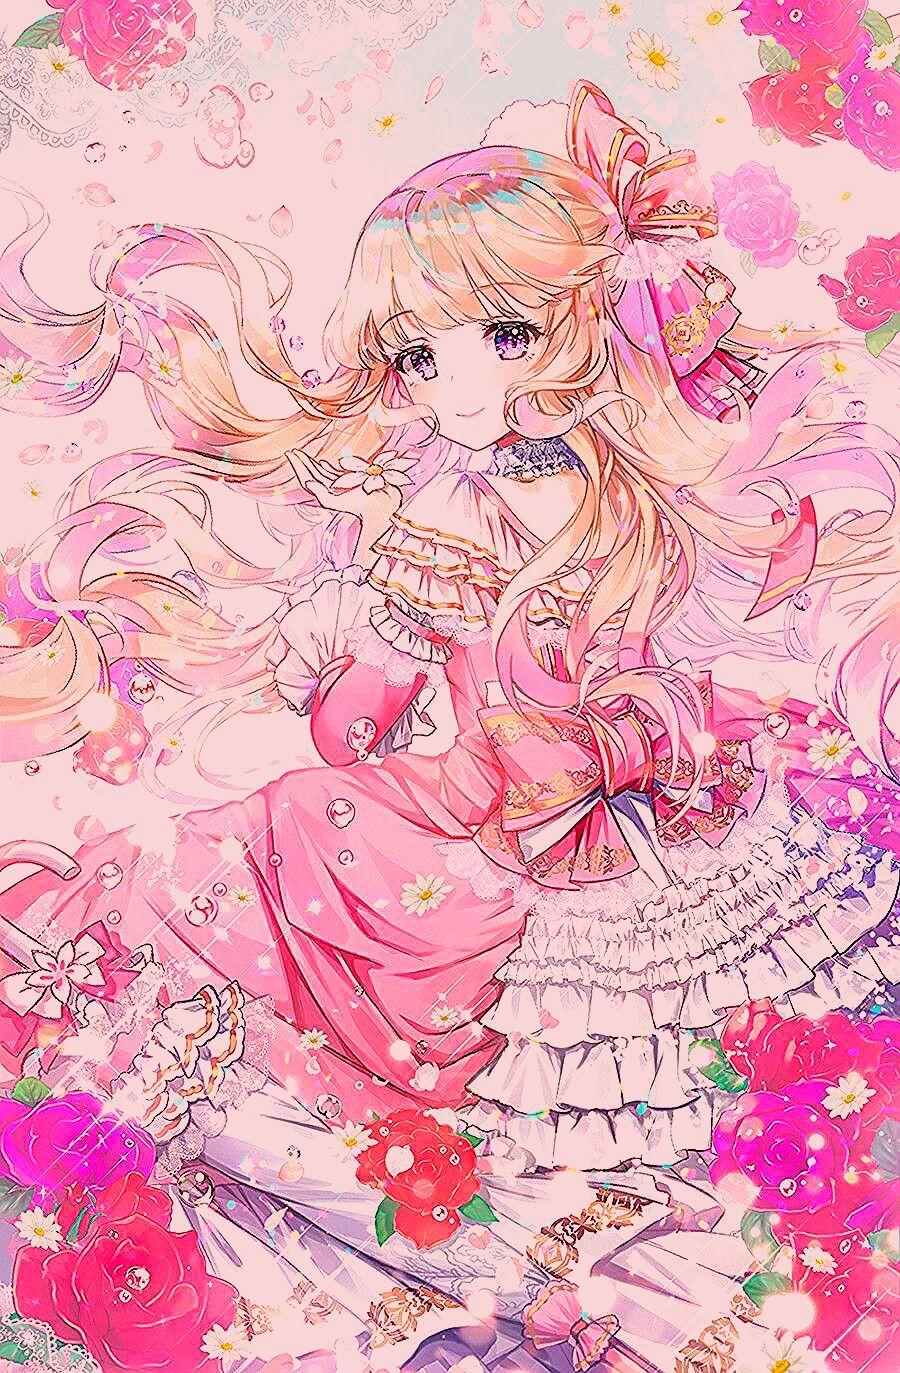 Girl Blonde Hair Pink Eyes Anime Princess Anime Friend Anime